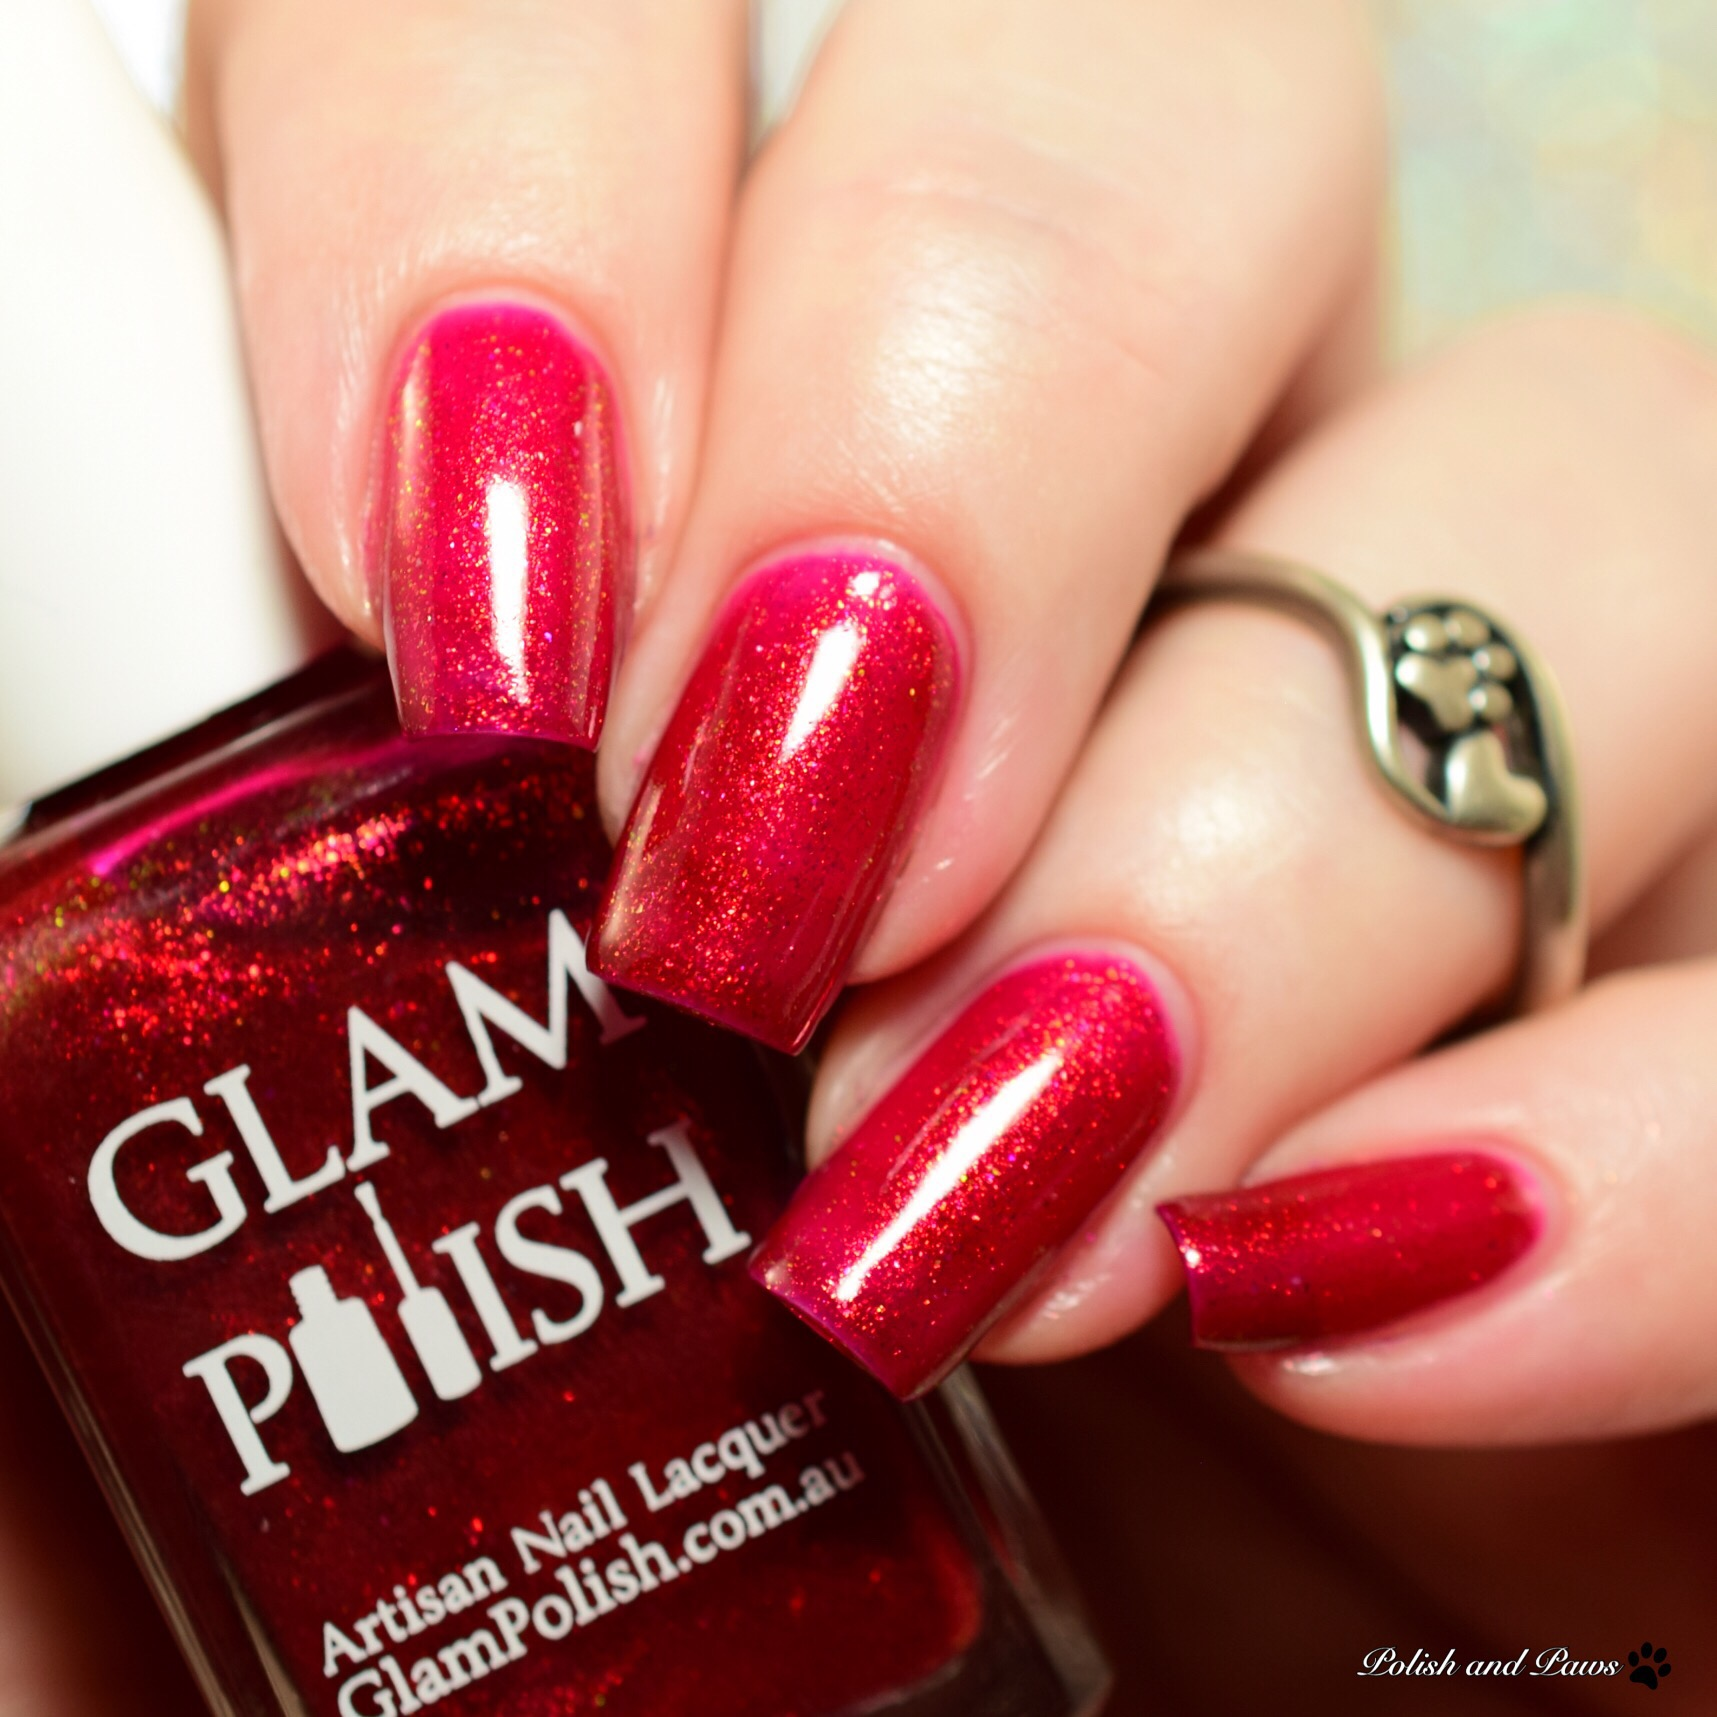 Glam Polish Wingardium Leviosa!